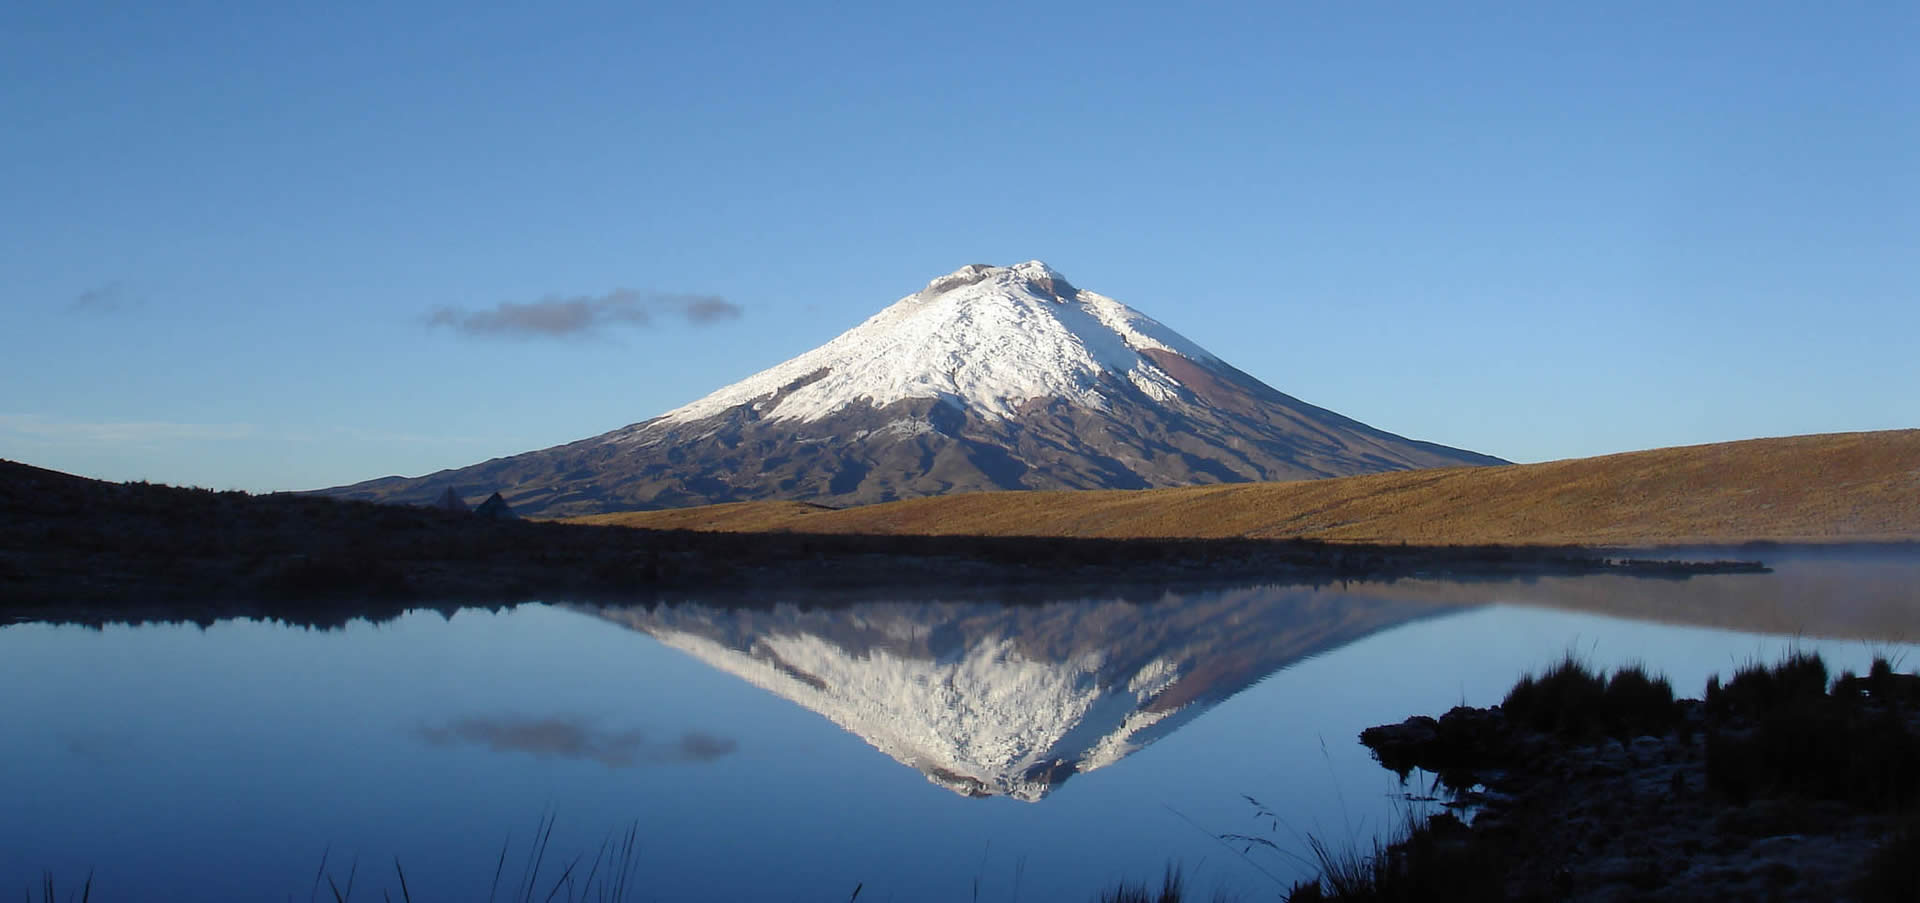 Ecuador Reisen & Galapagos Reisen | Handmade Travel